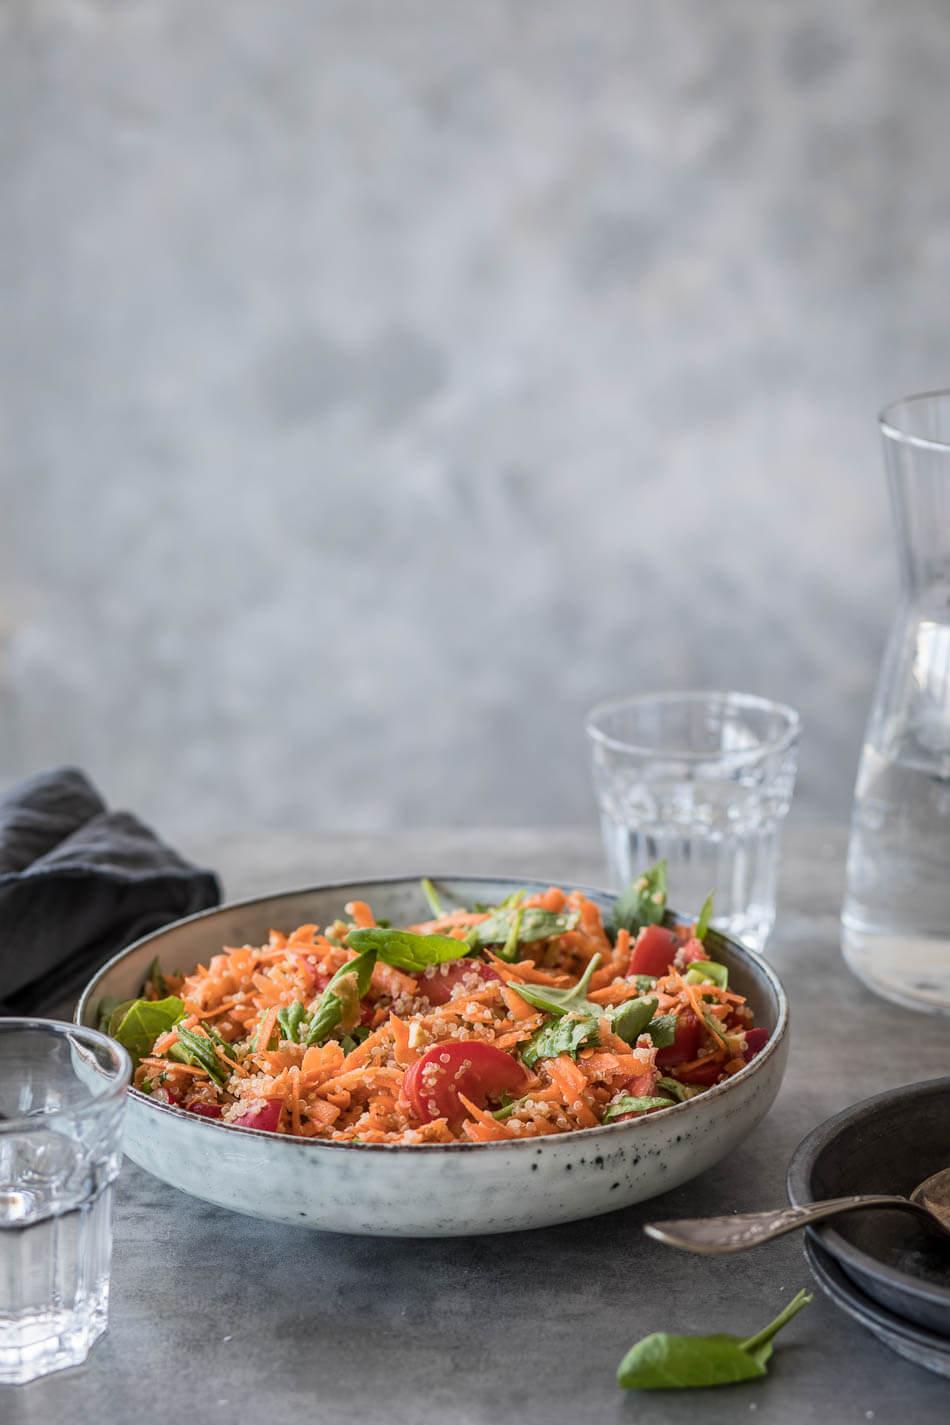 Spinazie-wortelsalade met quinoa | simoneskitchen.nl